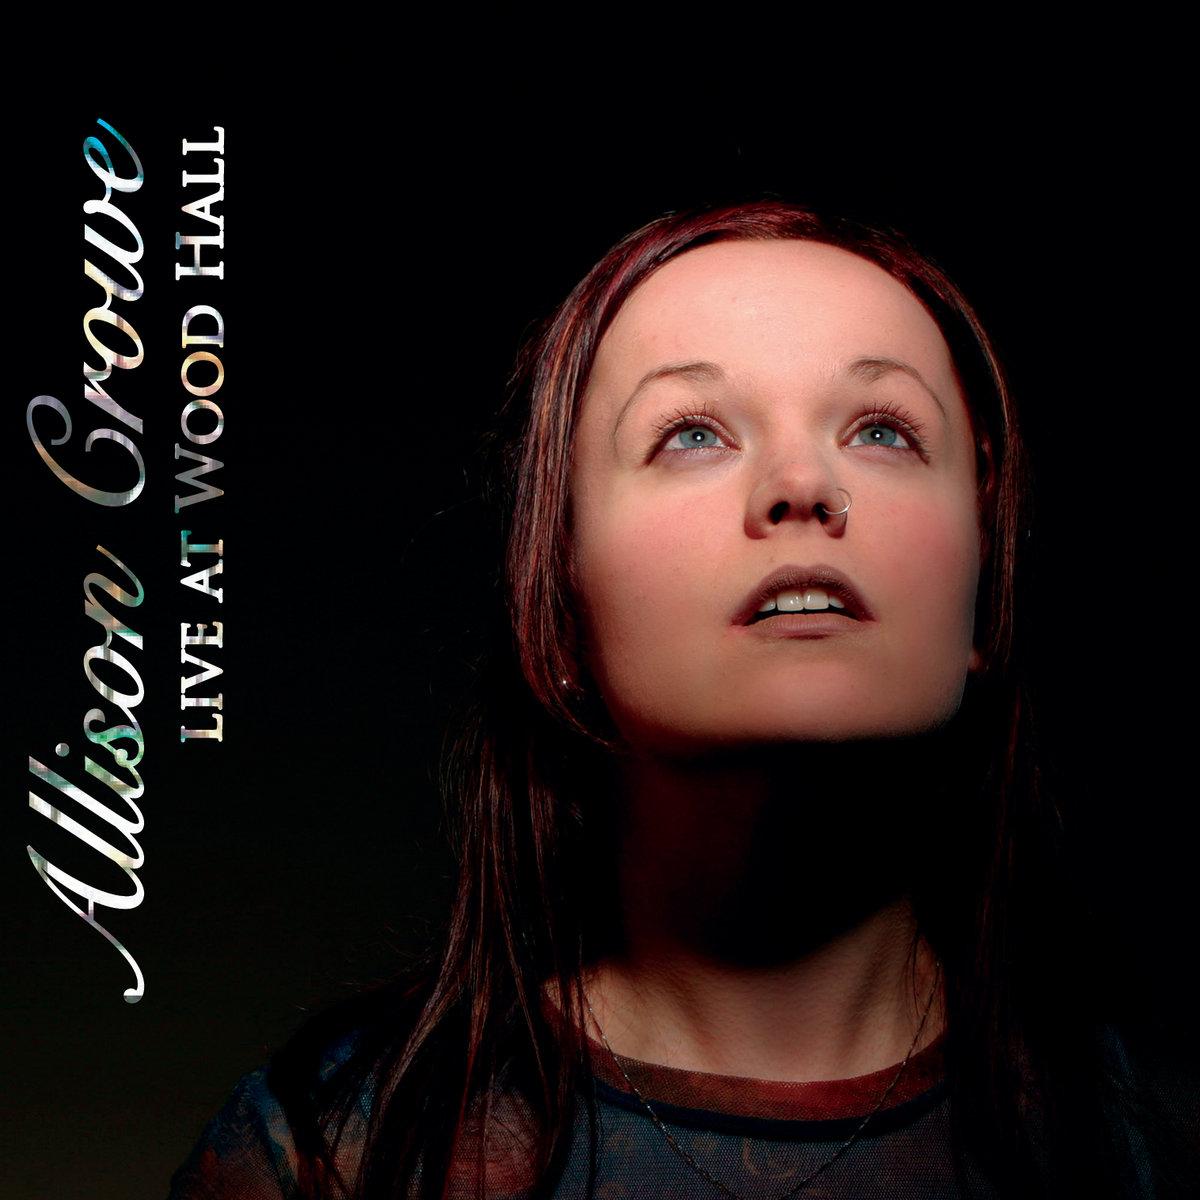 Allisoninlove in love in vain | allison crowe